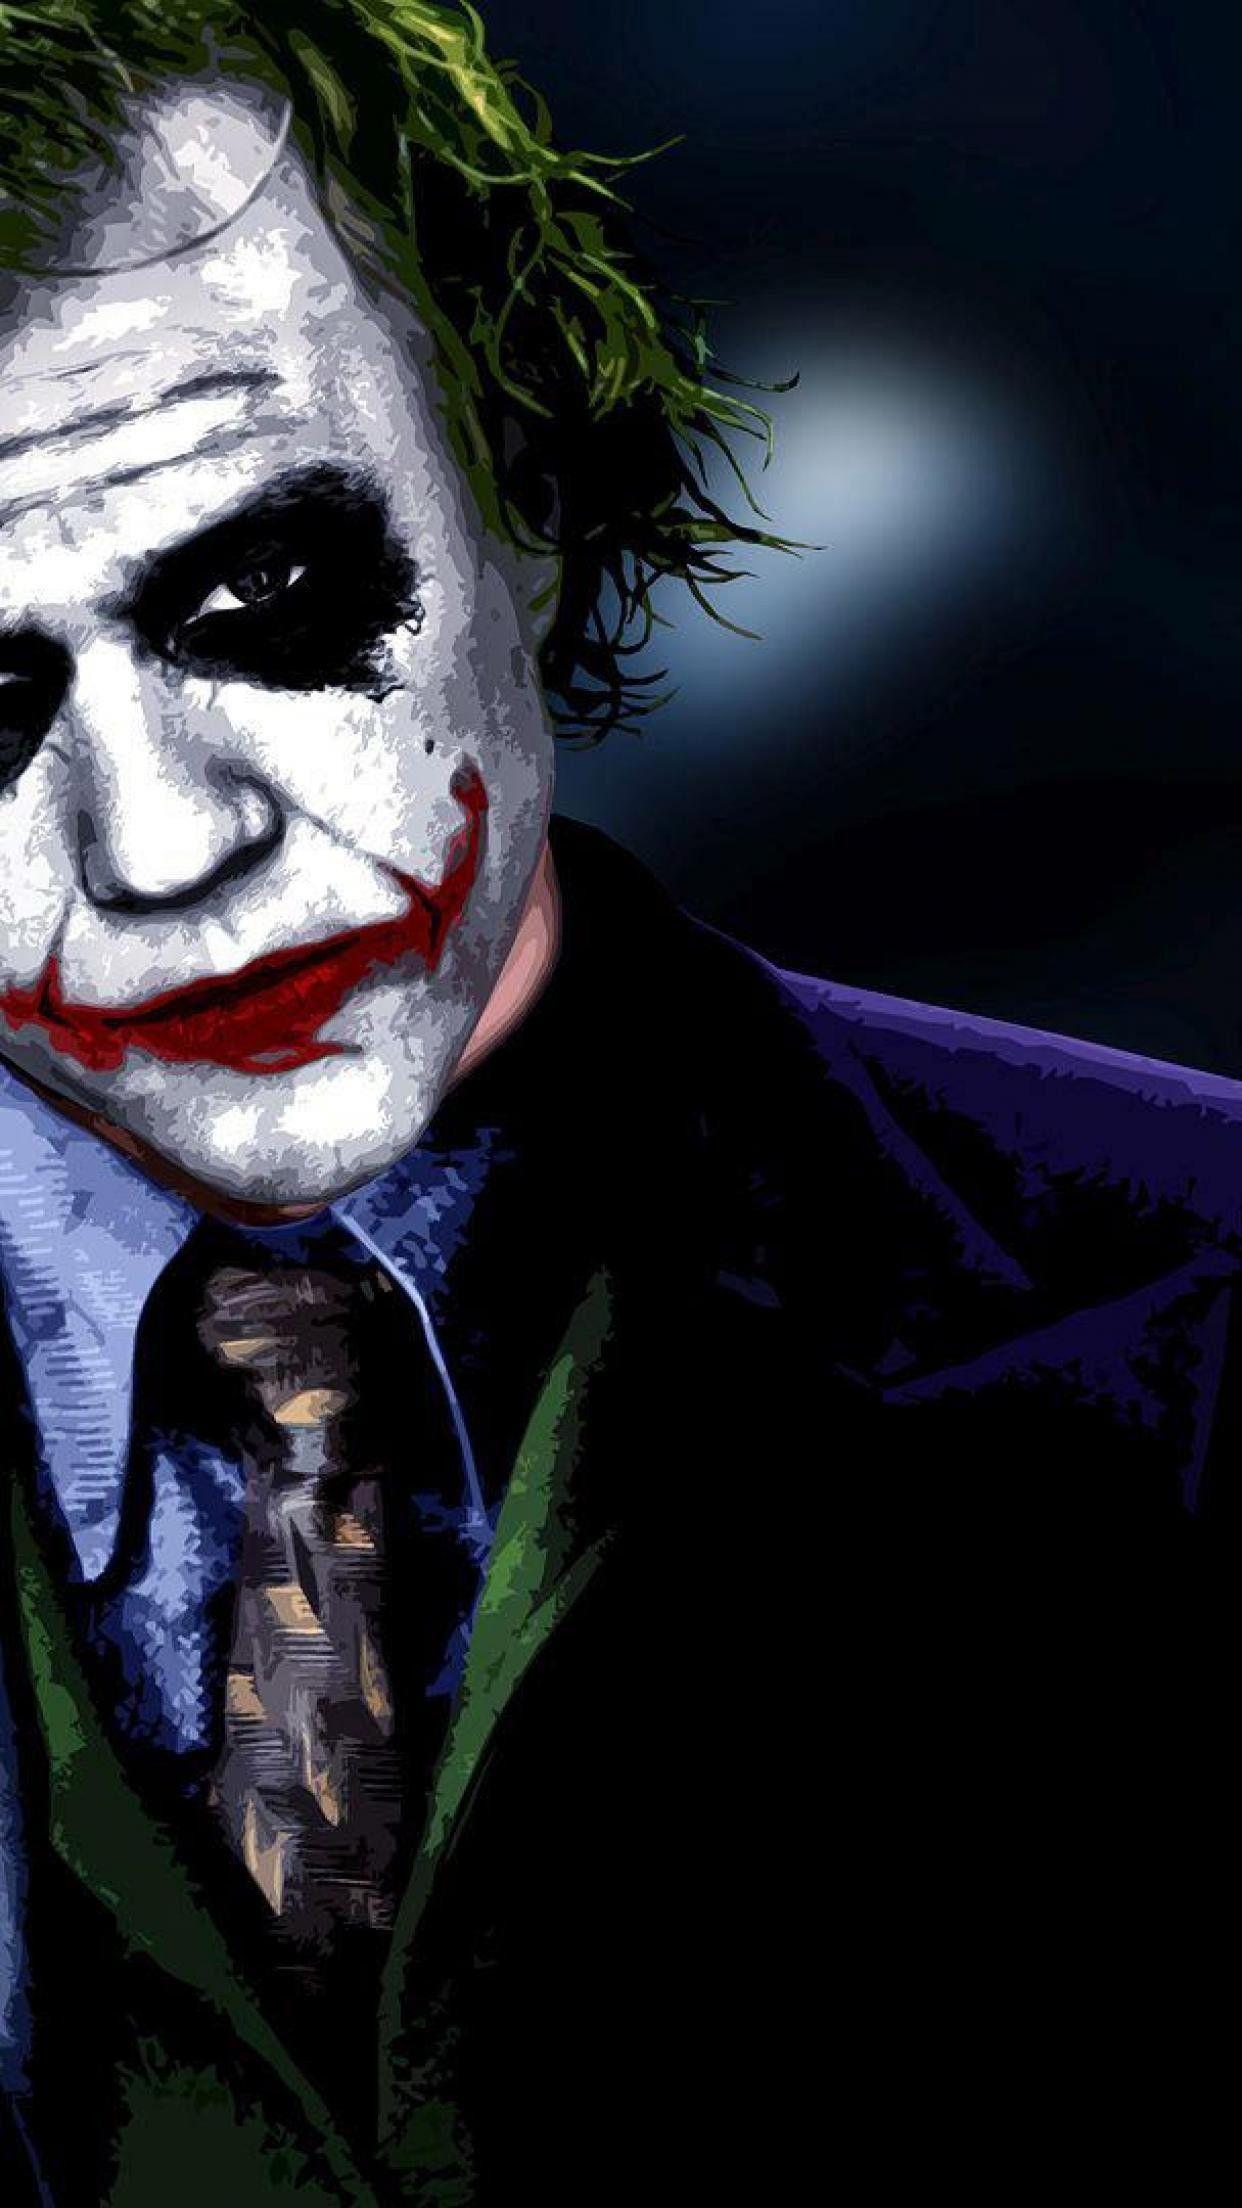 Joker Hd Wallpapers 1080p 80 Images Joker Iphone Wallpaper Joker Pics Joker Images